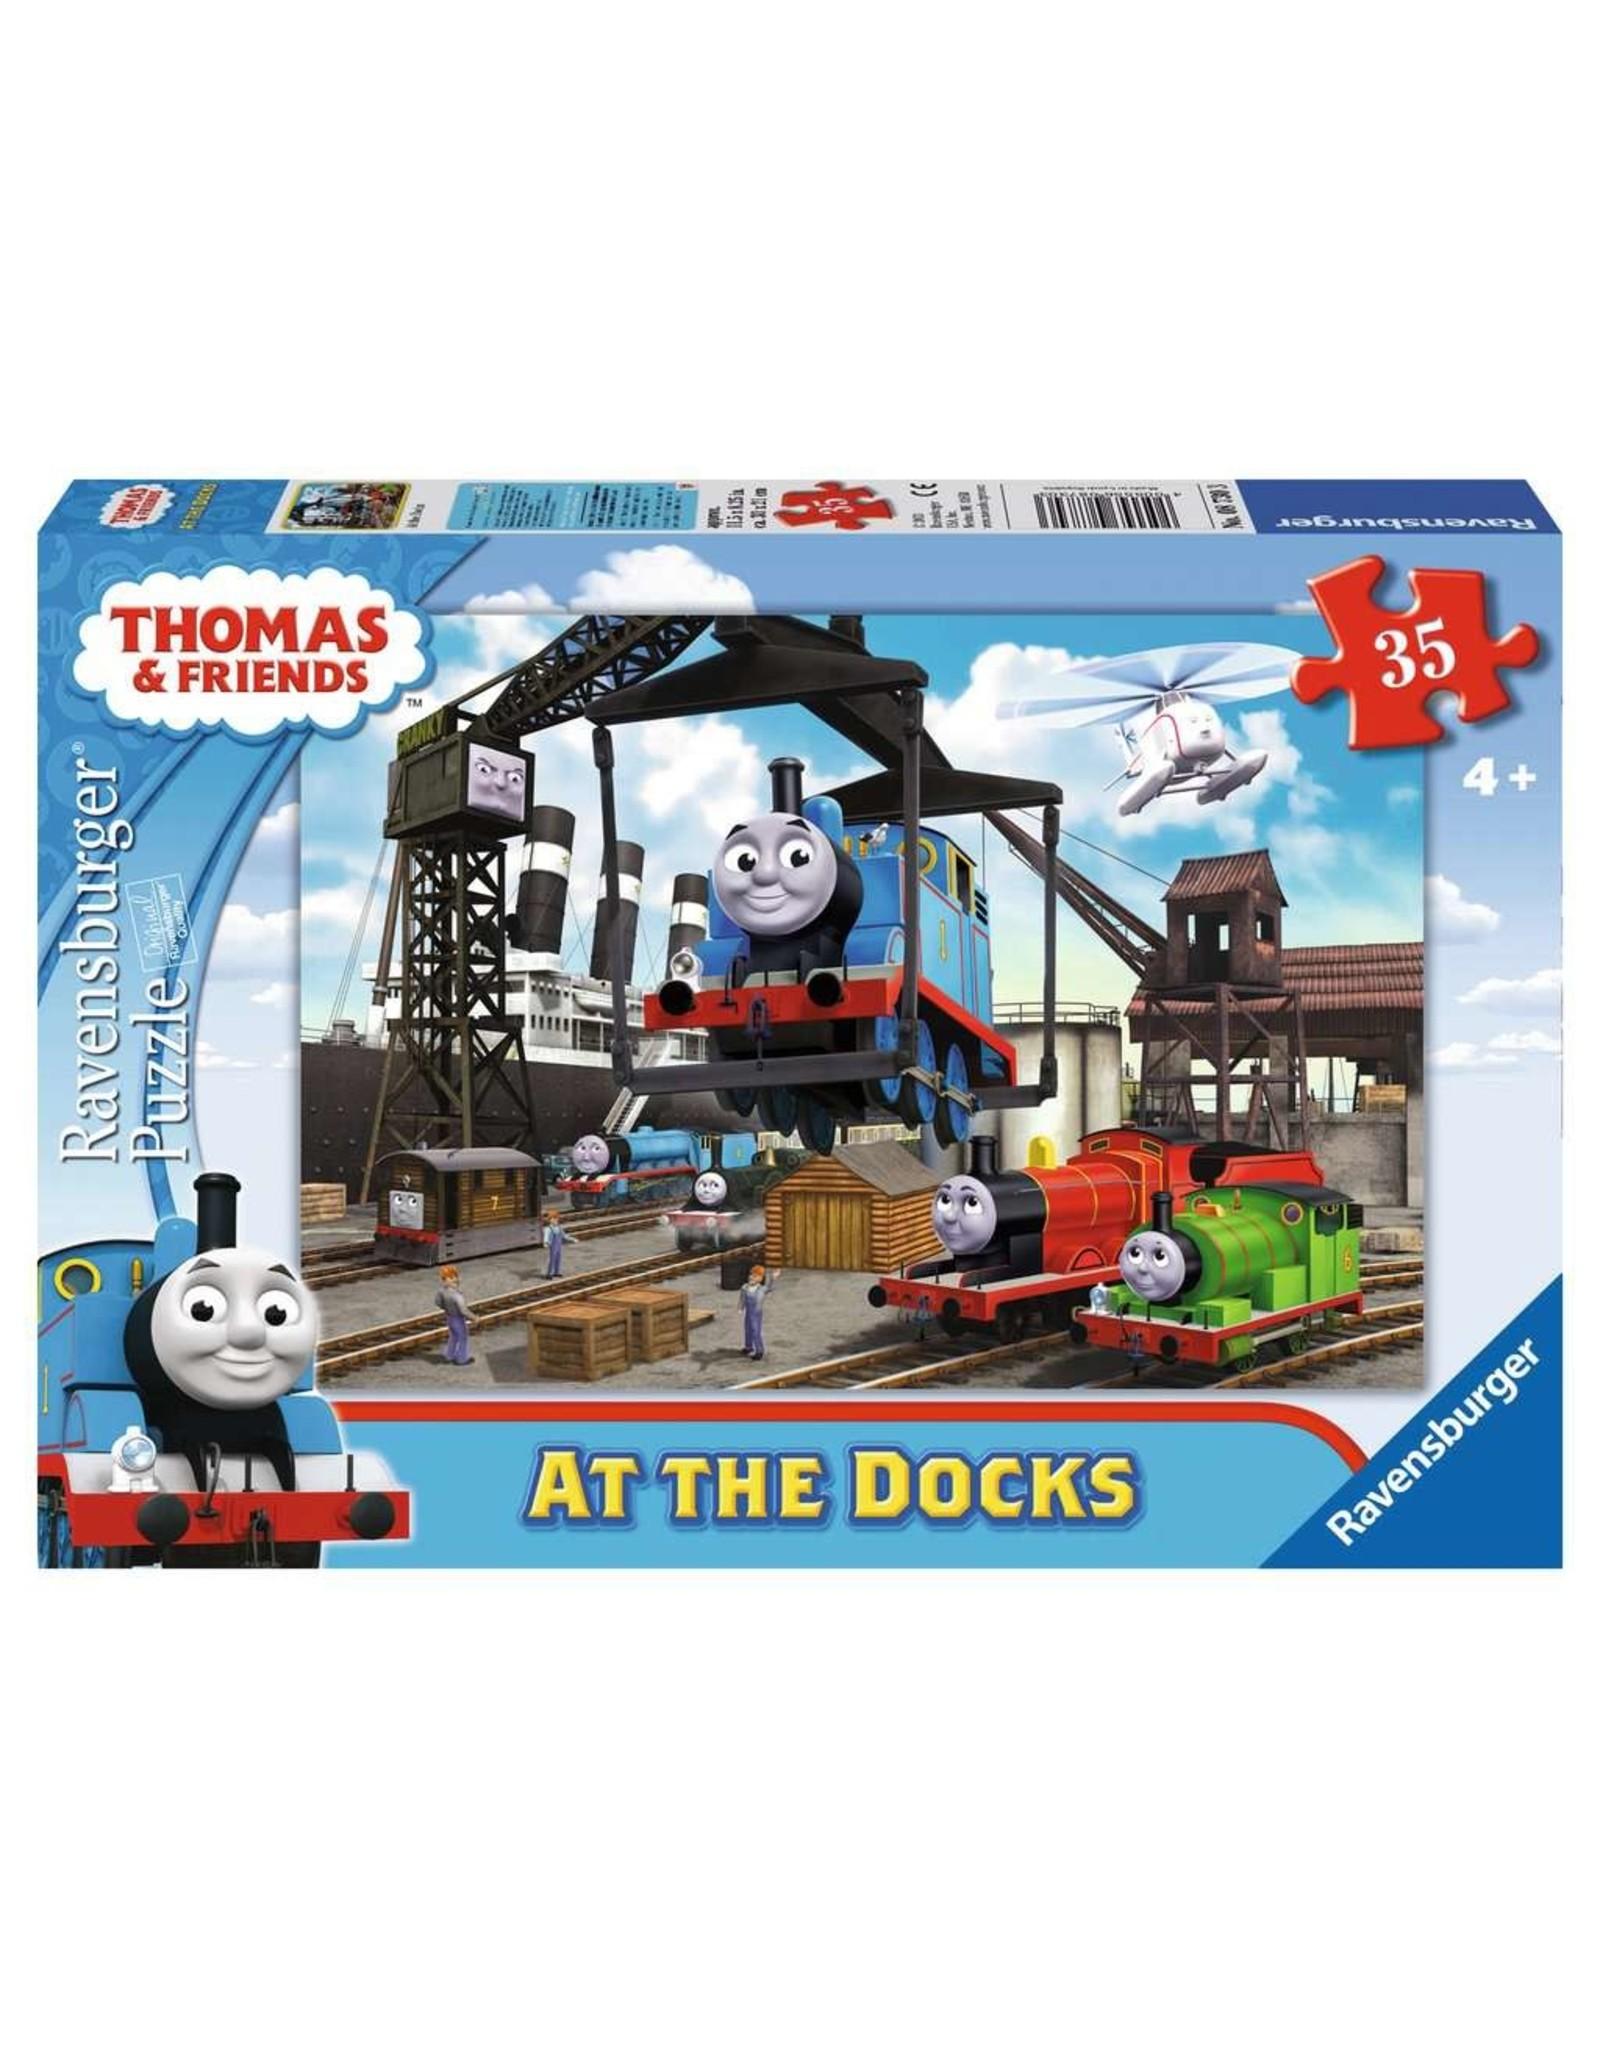 Ravensburger Thomas & Friends: At the Docks 35pc Puzzle